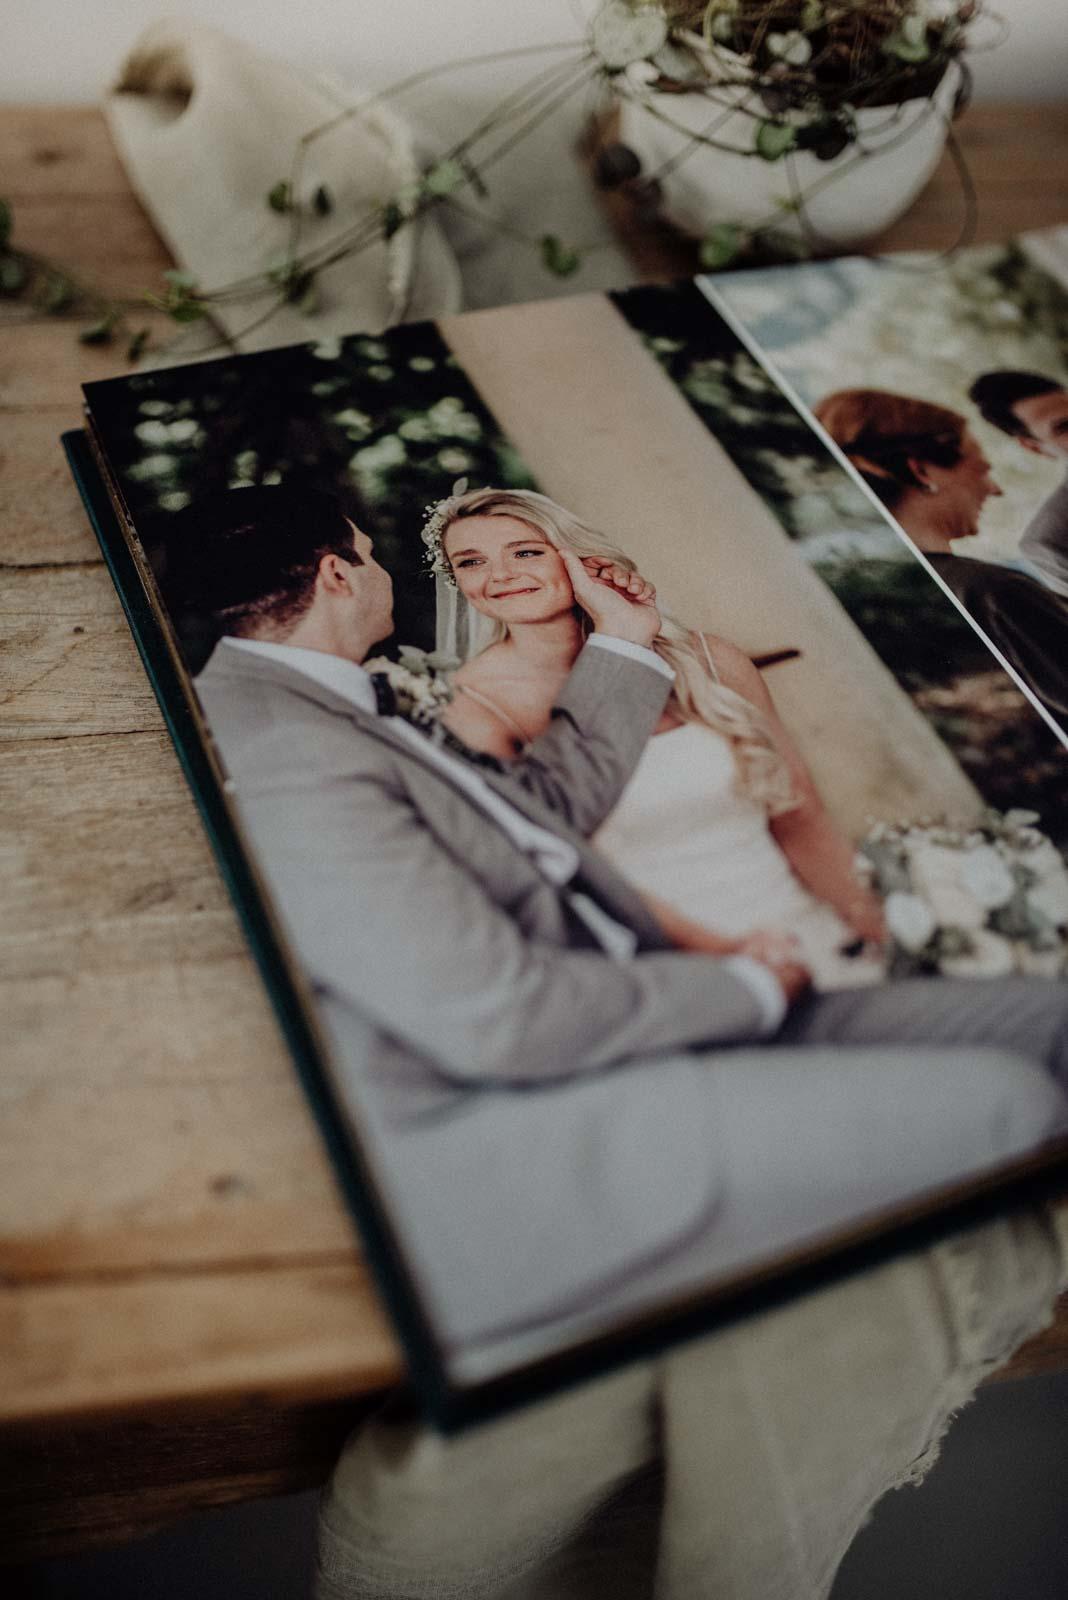 031-Fotoalbum-Fotobuch-Premium-Fotograf-Witten-Luxus